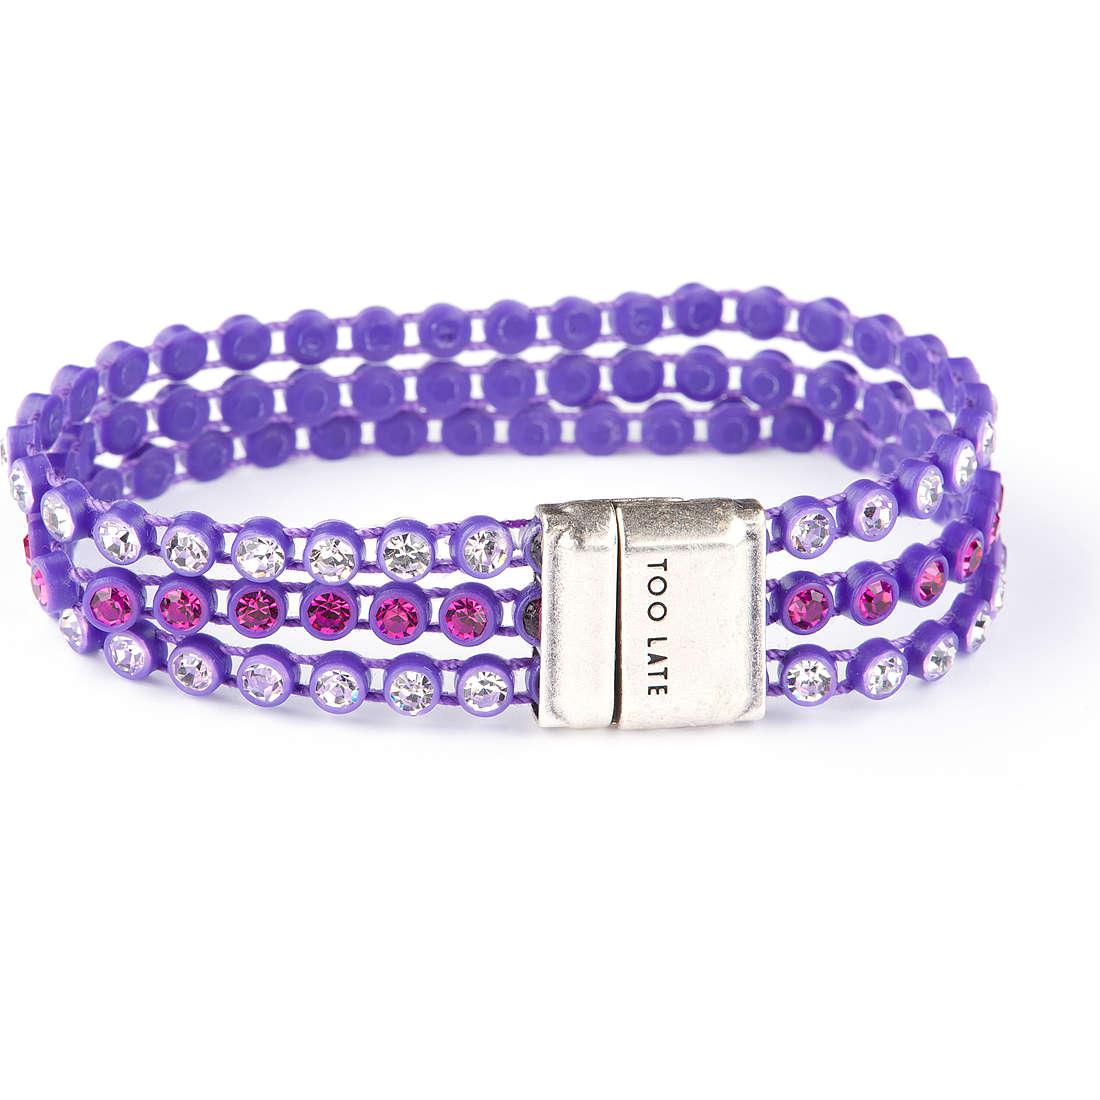 bracelet woman jewellery Too late 8052745221853